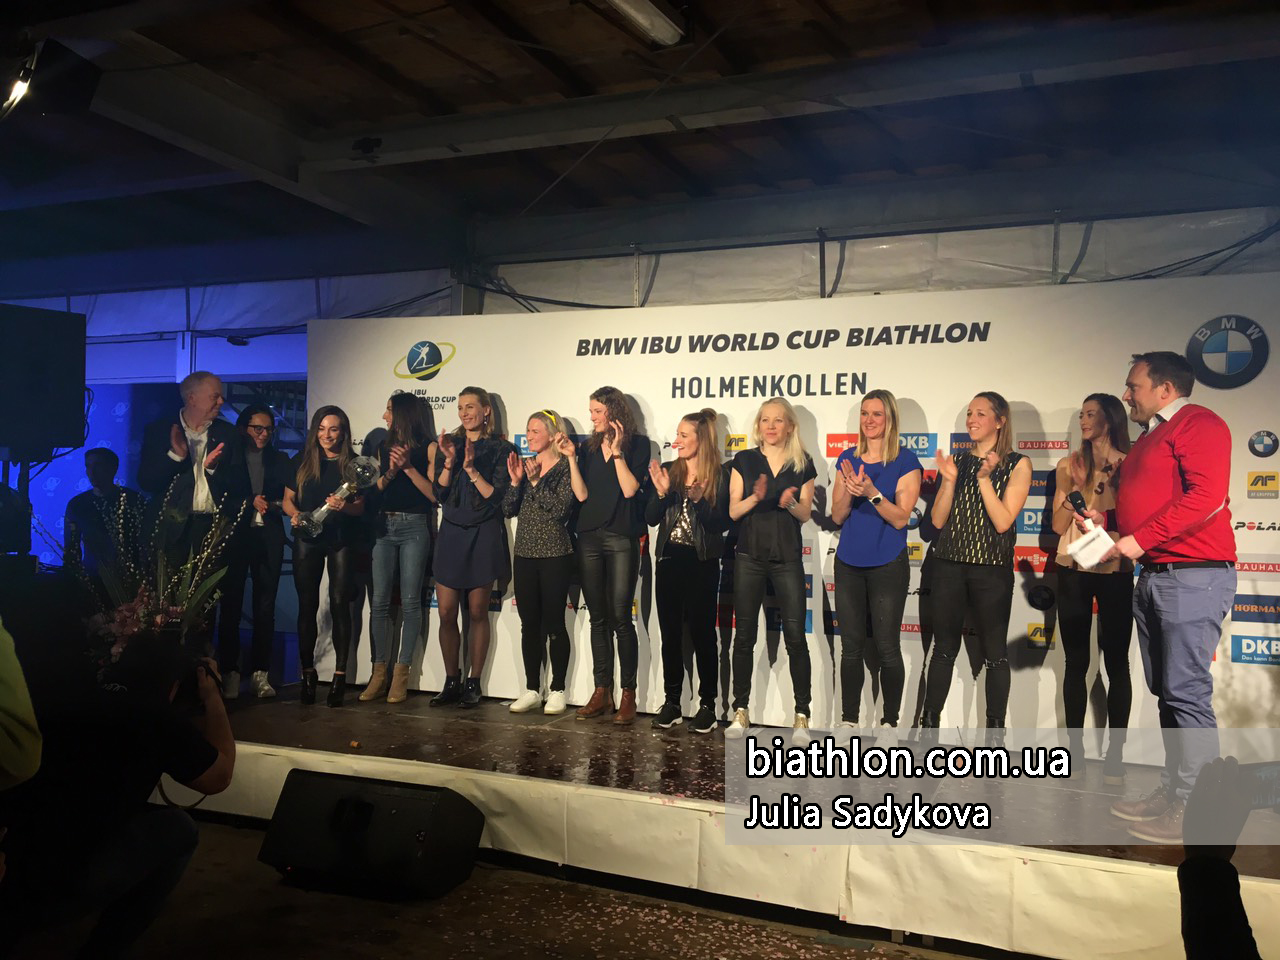 https://www.biathlon.com.ua/uploads/2019/99307.jpg